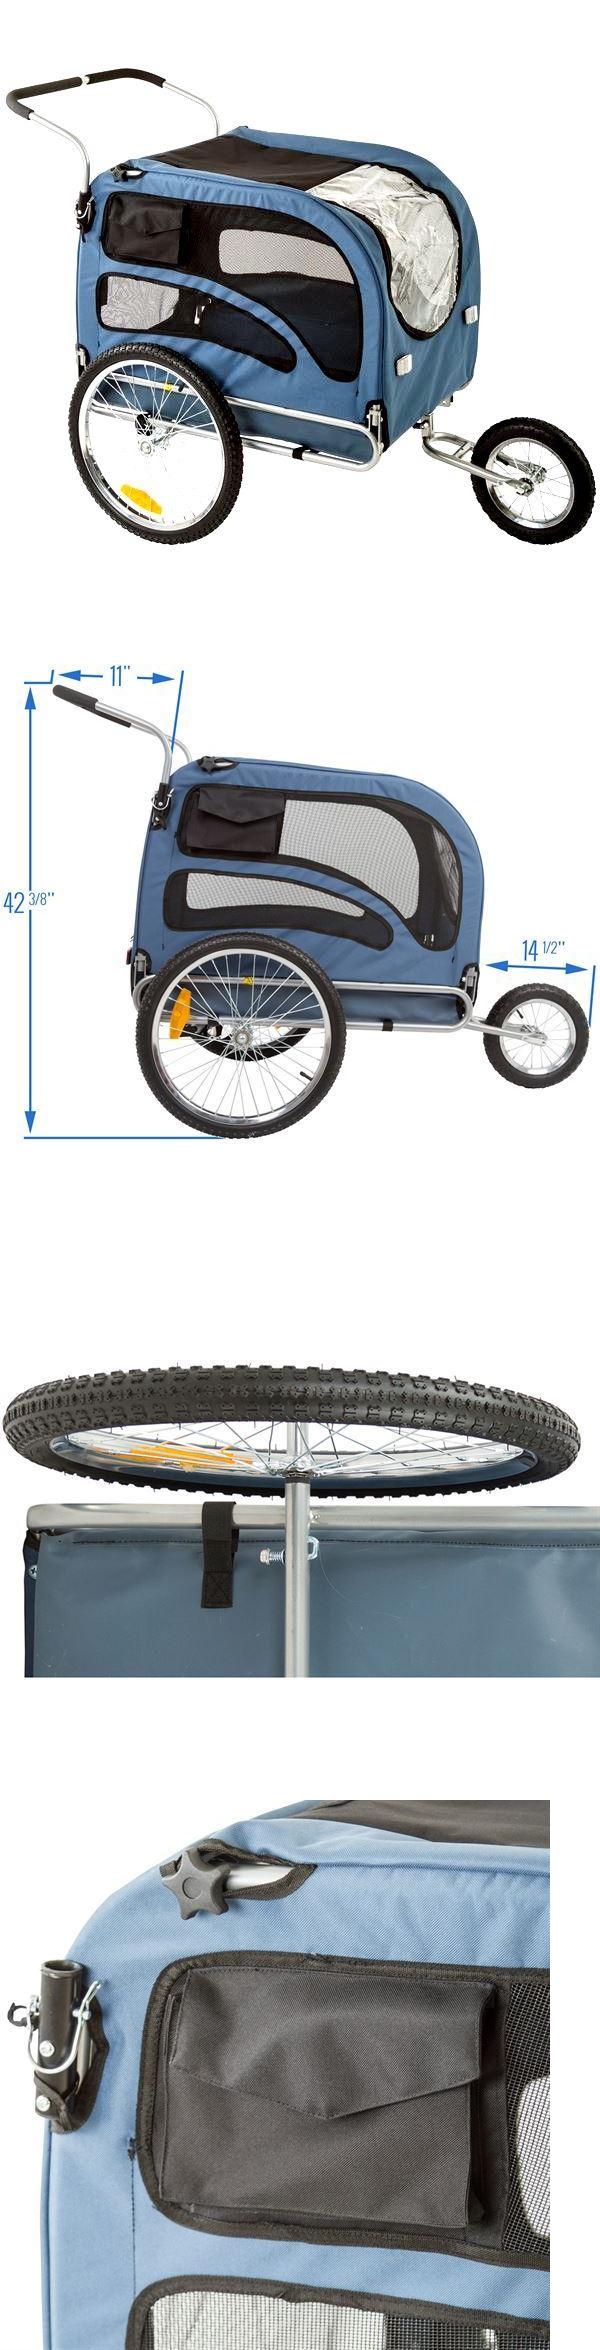 Bike baskets and trailers pound capacity dog trailer